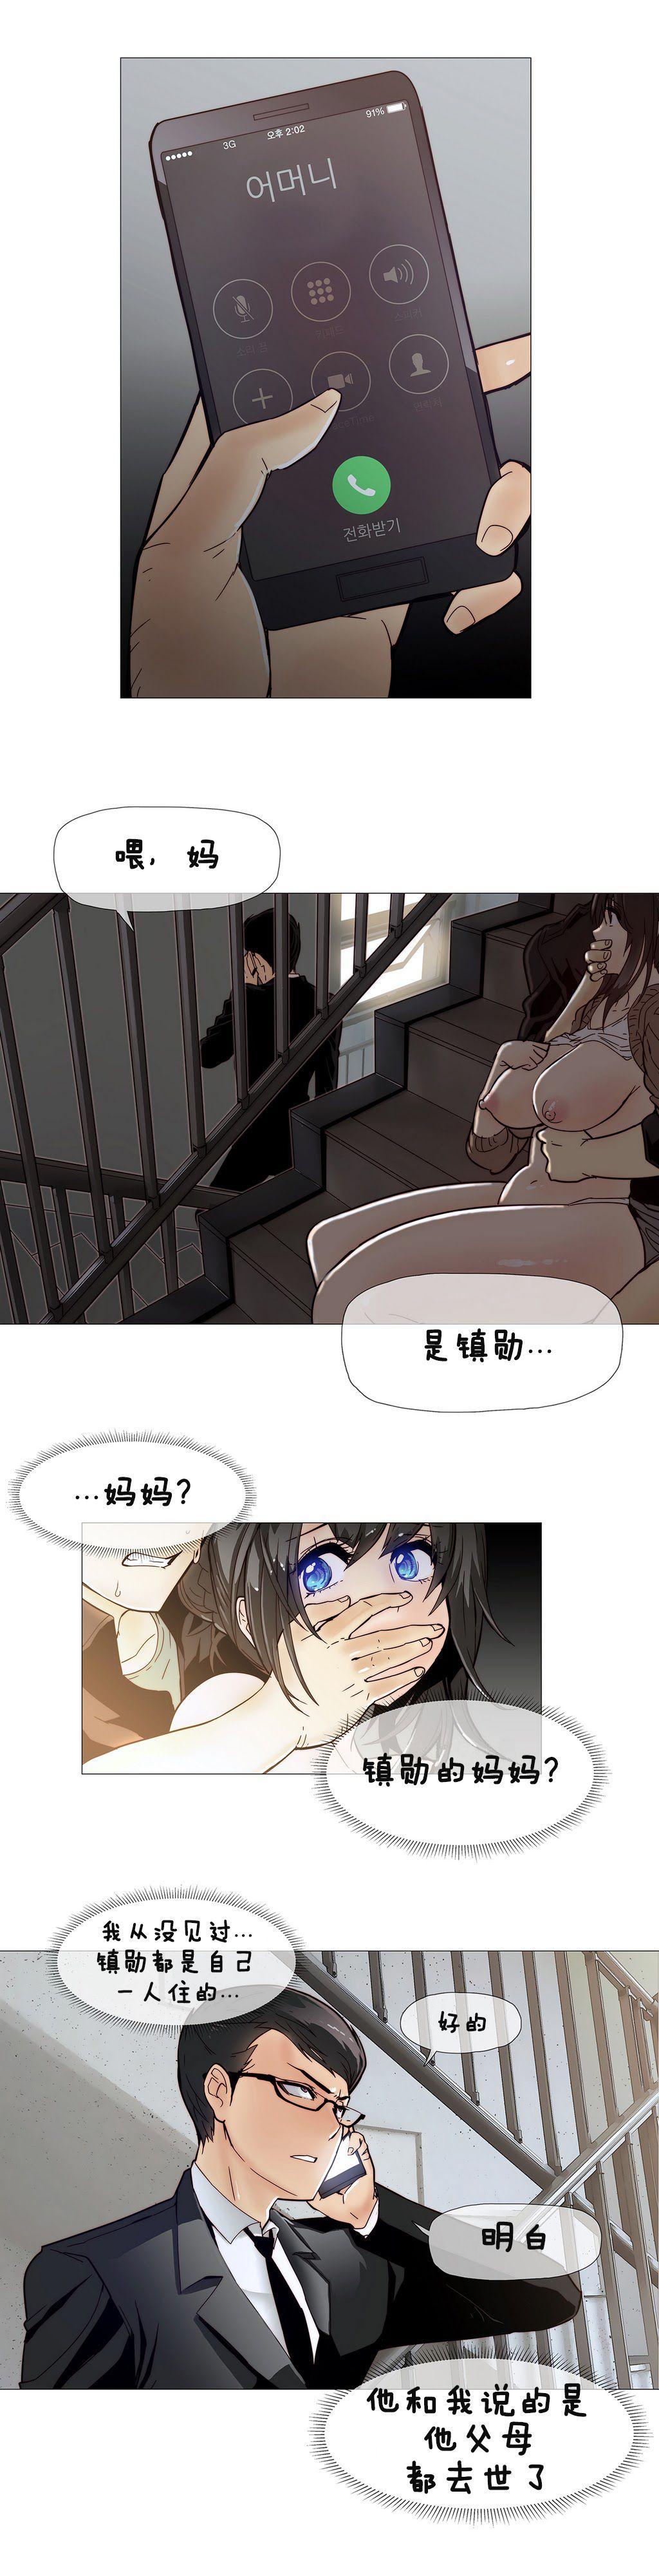 HouseHold Affairs 【卞赤鲤汉化】1~15话 148